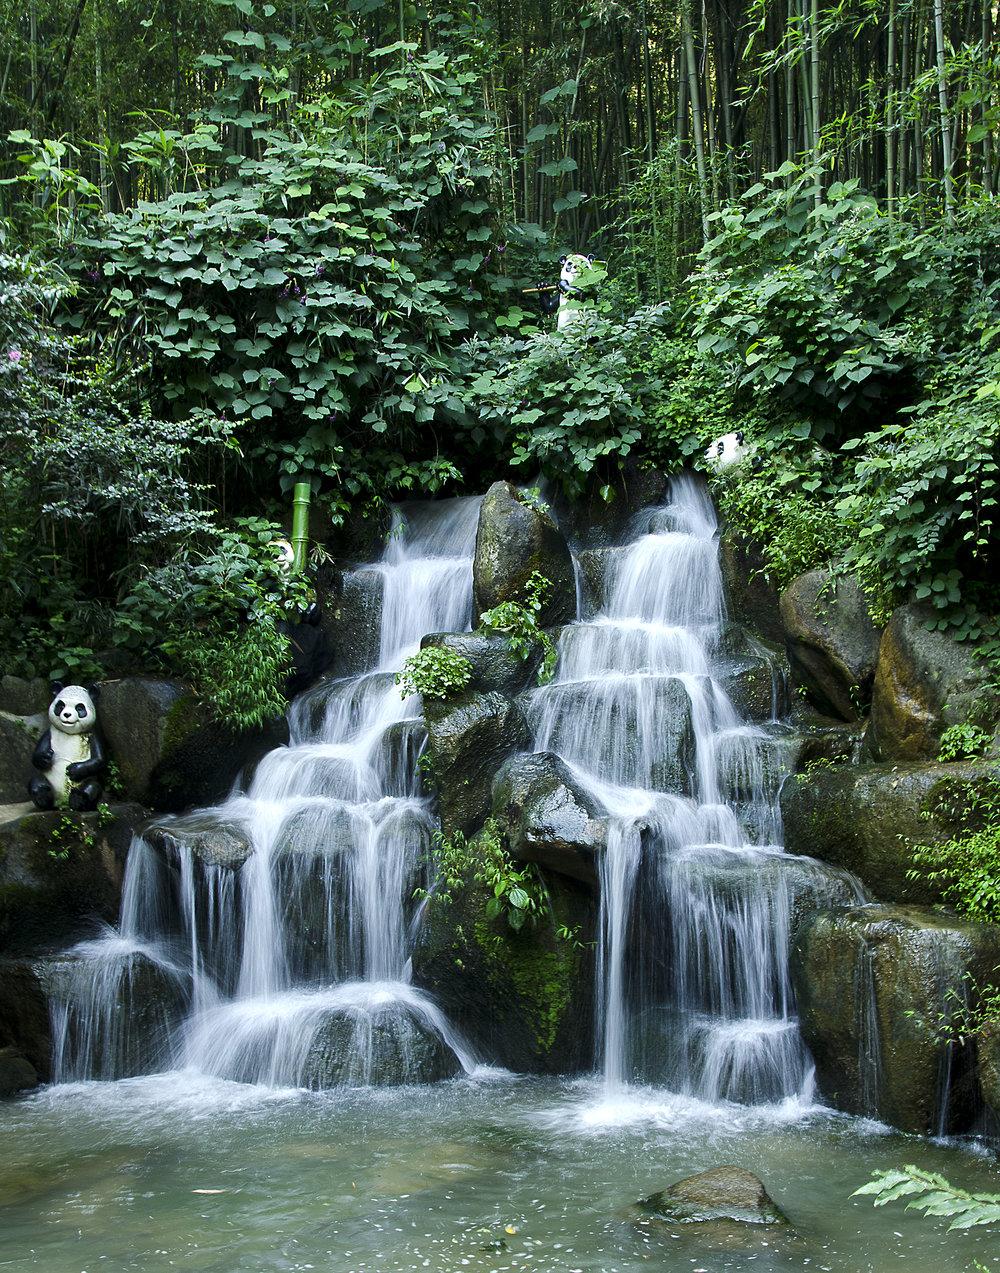 Spencer_Drake_Panda's_Waterfall_Photography_Waterfall_Korea_water_bamboo_forest_panda_green.jpg